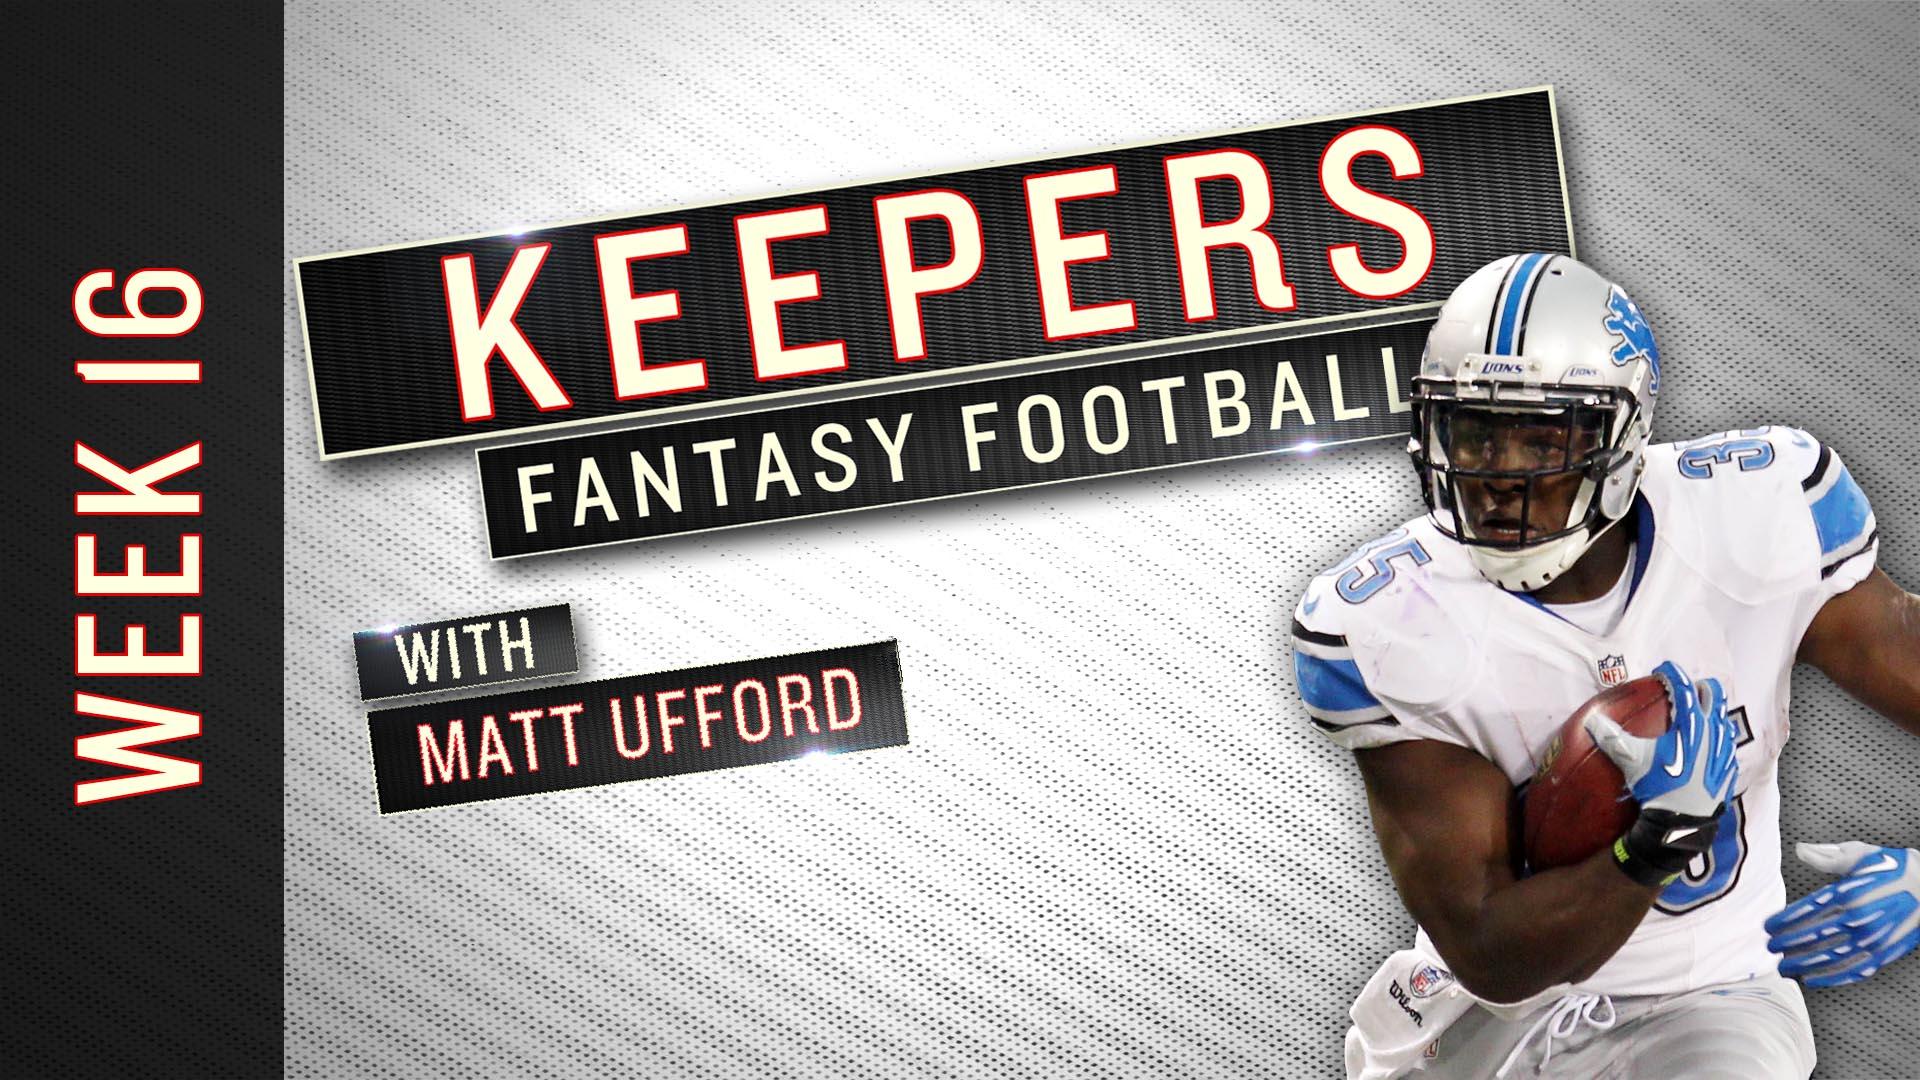 Fantasy Football Keepers - SBNation.com